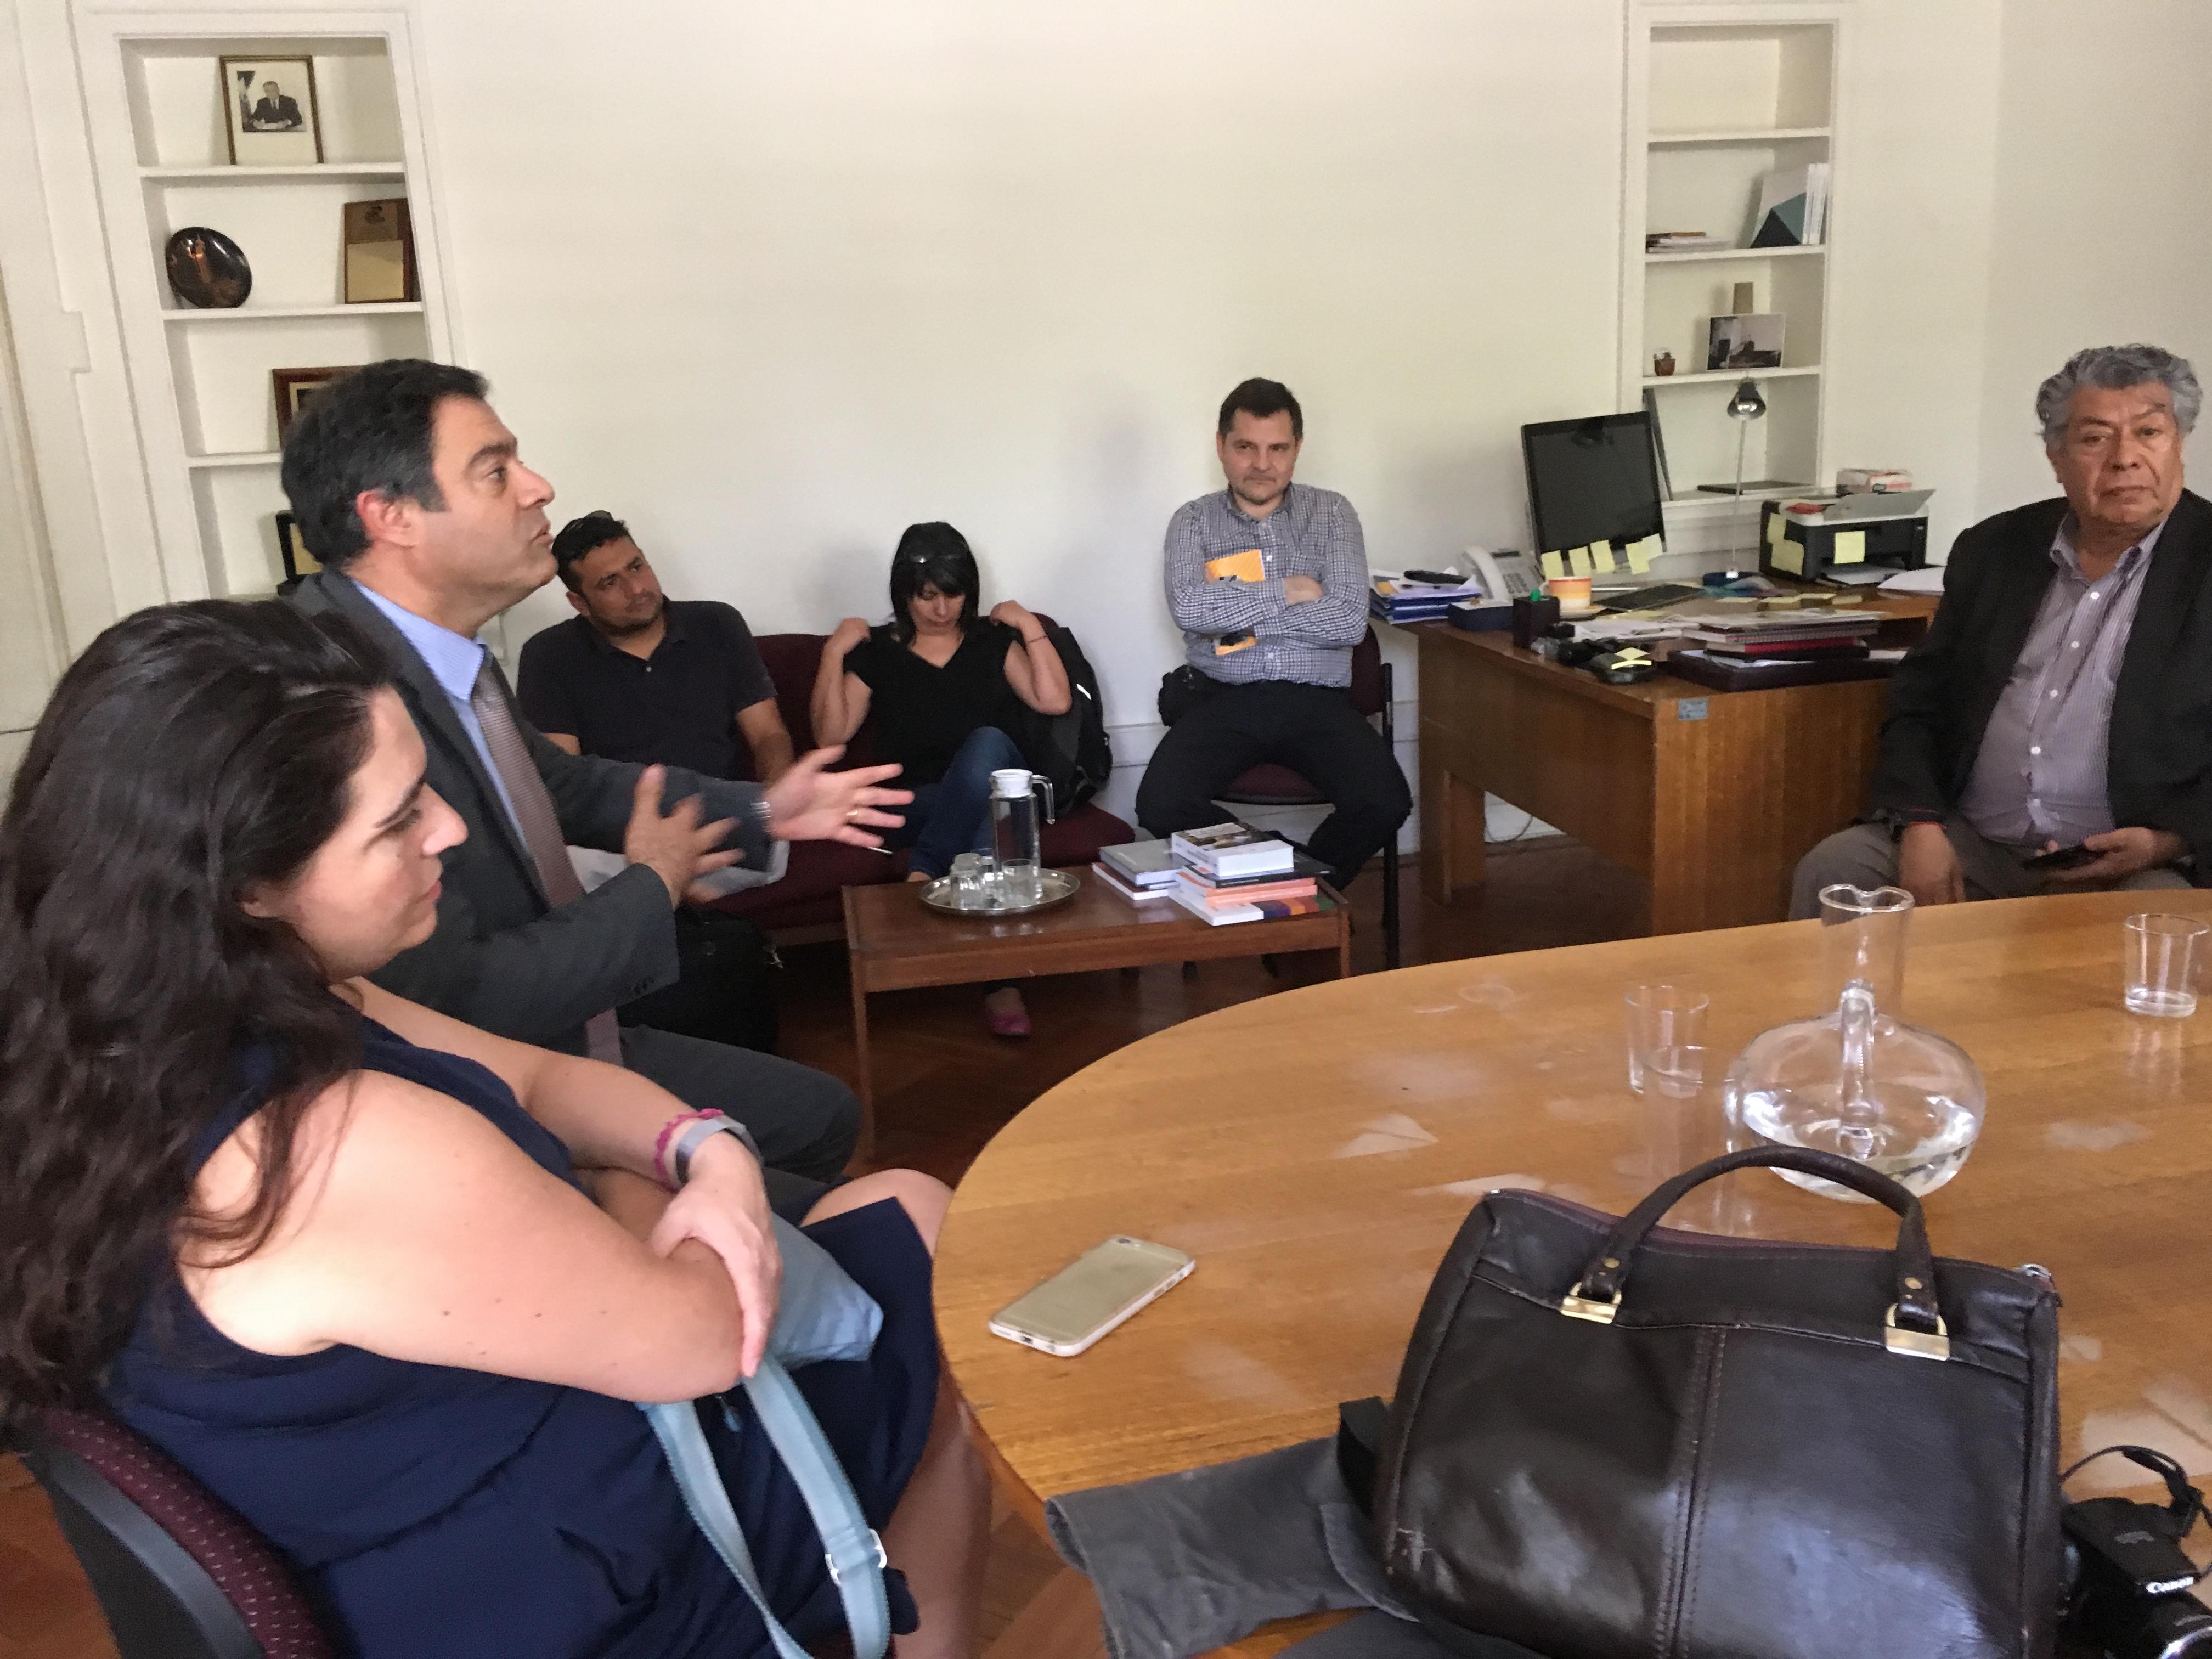 FTH se reúen con ANEF por procesos del personal a contrata - 11 Diciembre 2017